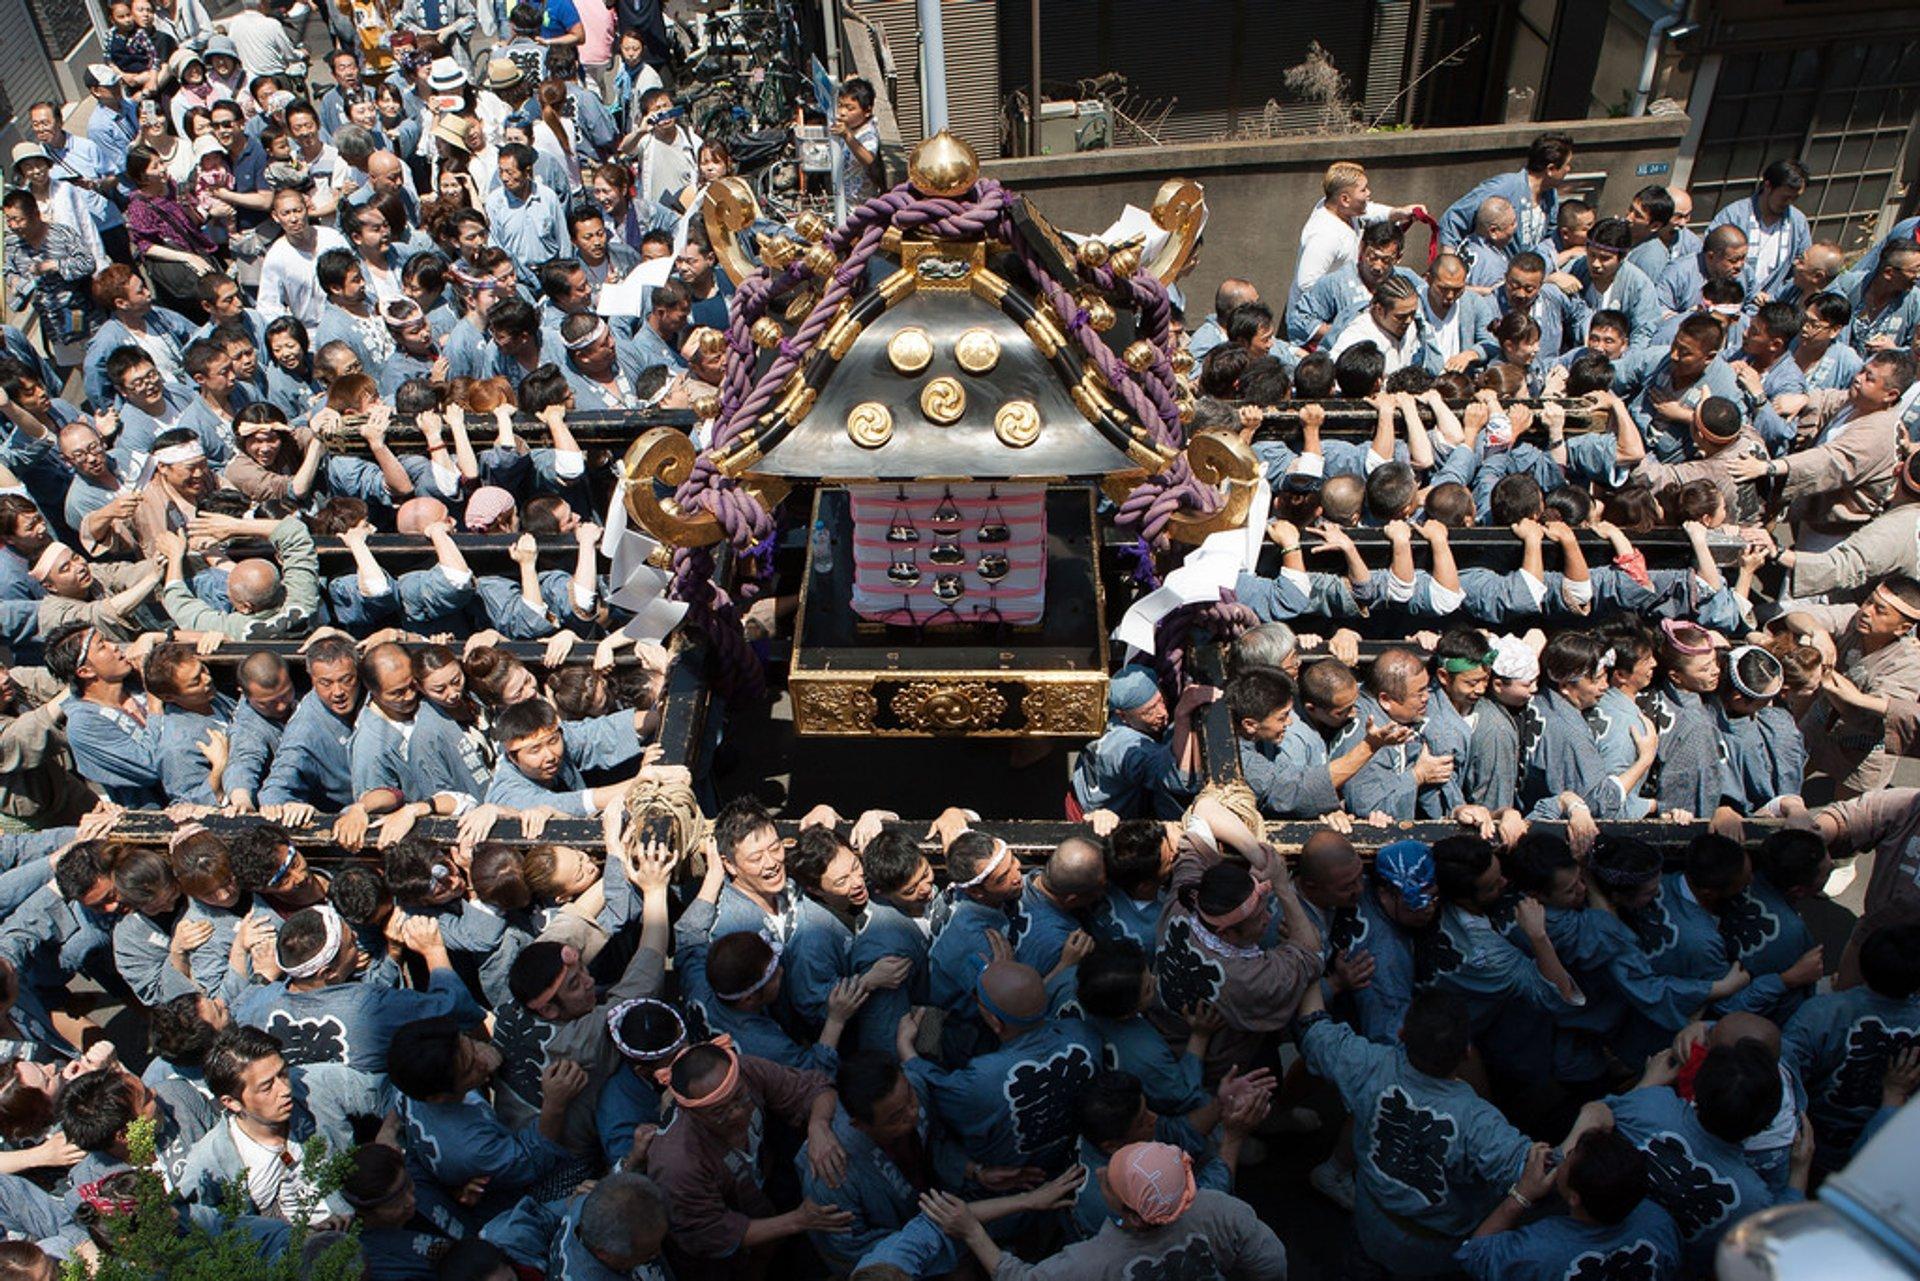 Asakusa Sanja Matsuri Festival in Tokyo 2020 - Best Time